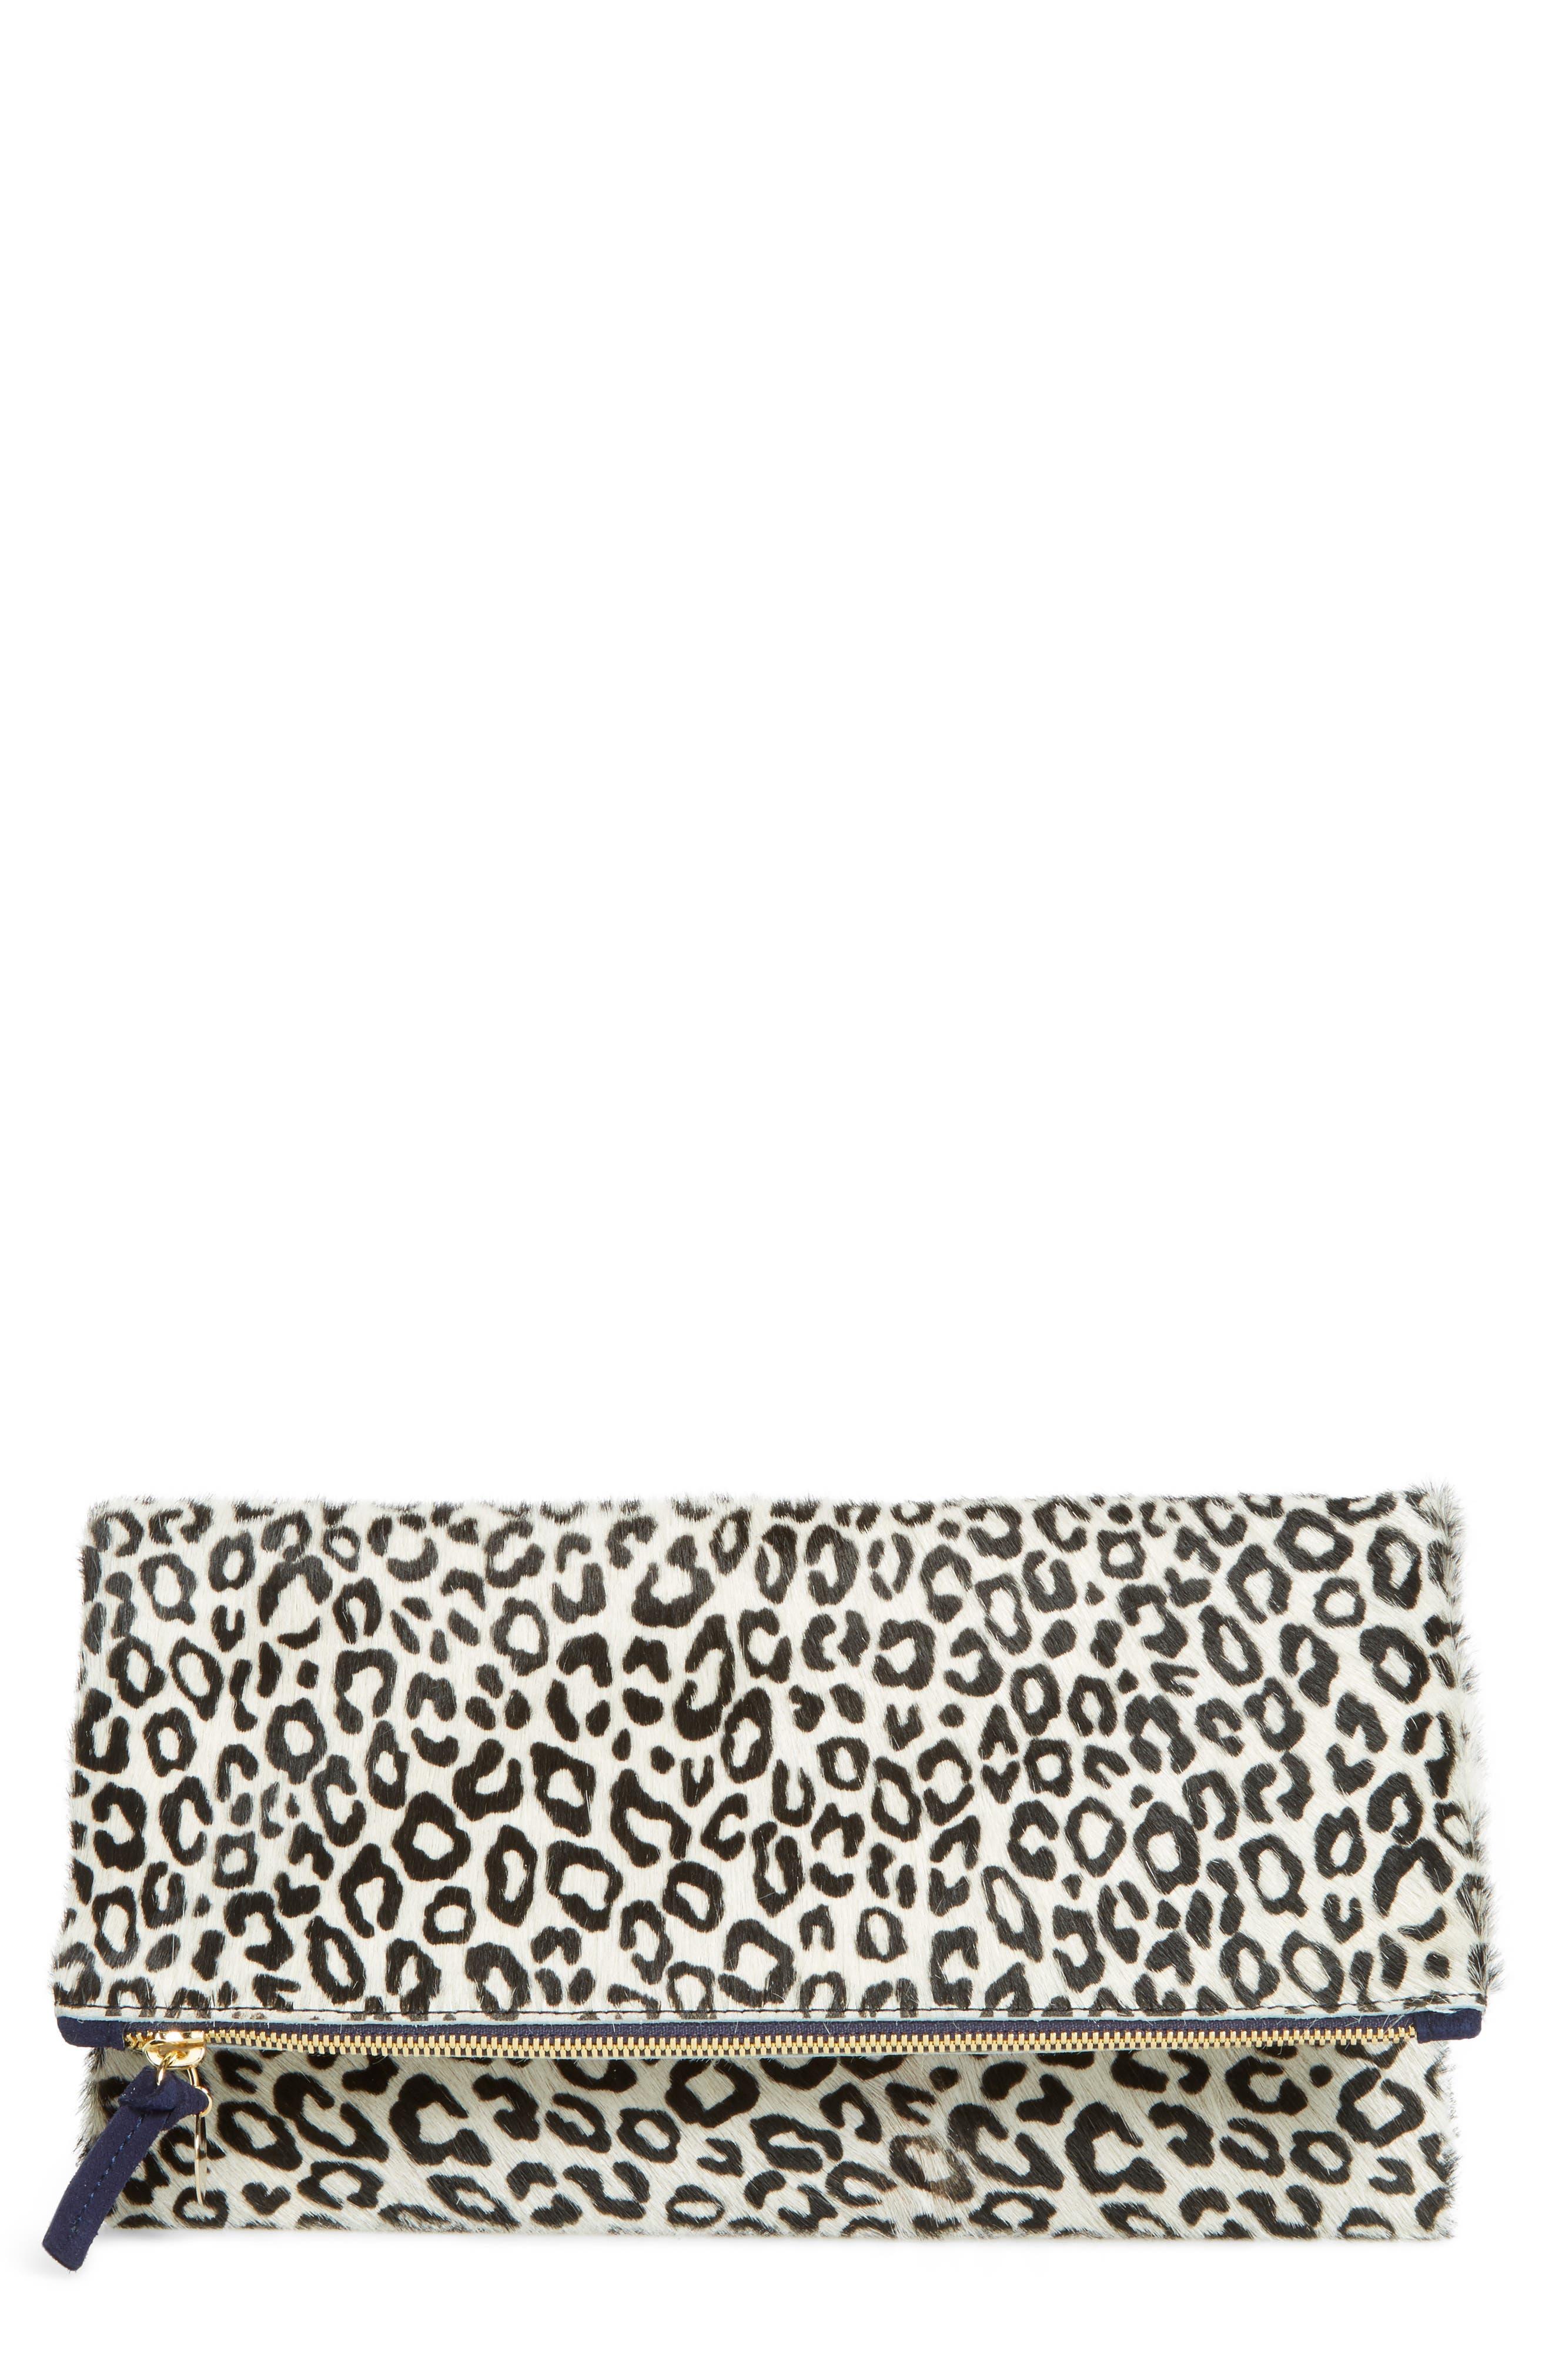 Ocelot Print Genuine Calf Hair Foldover Clutch,                             Main thumbnail 1, color,                             001